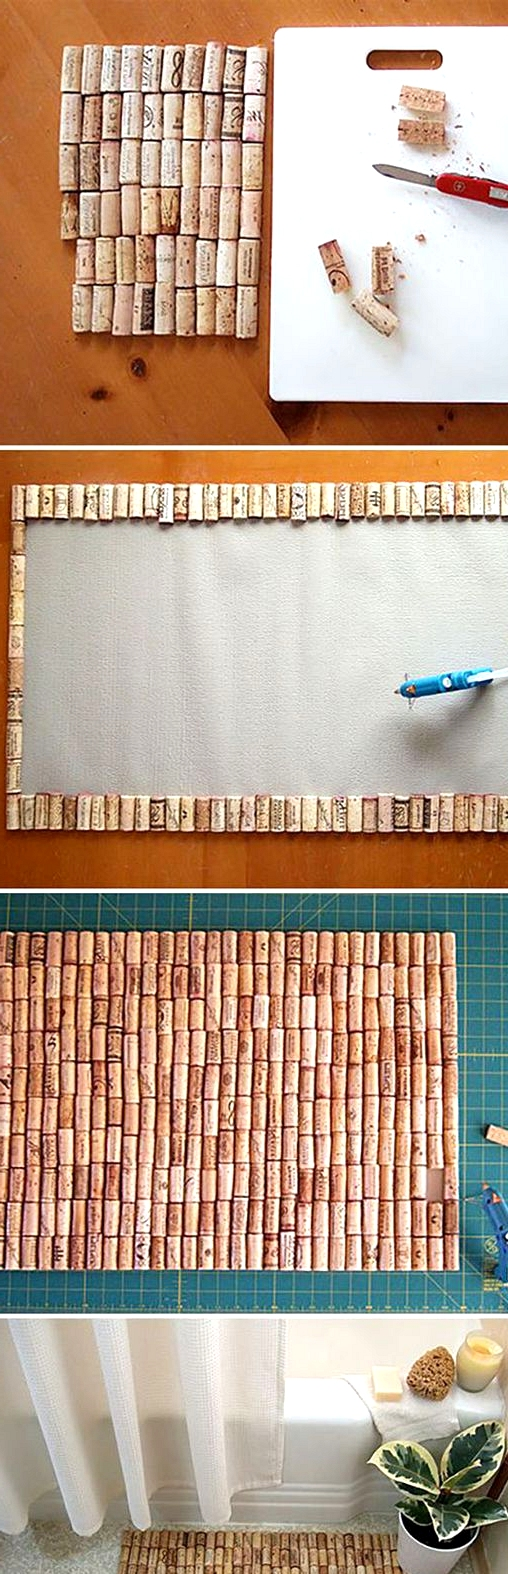 create a brilliant cork rug